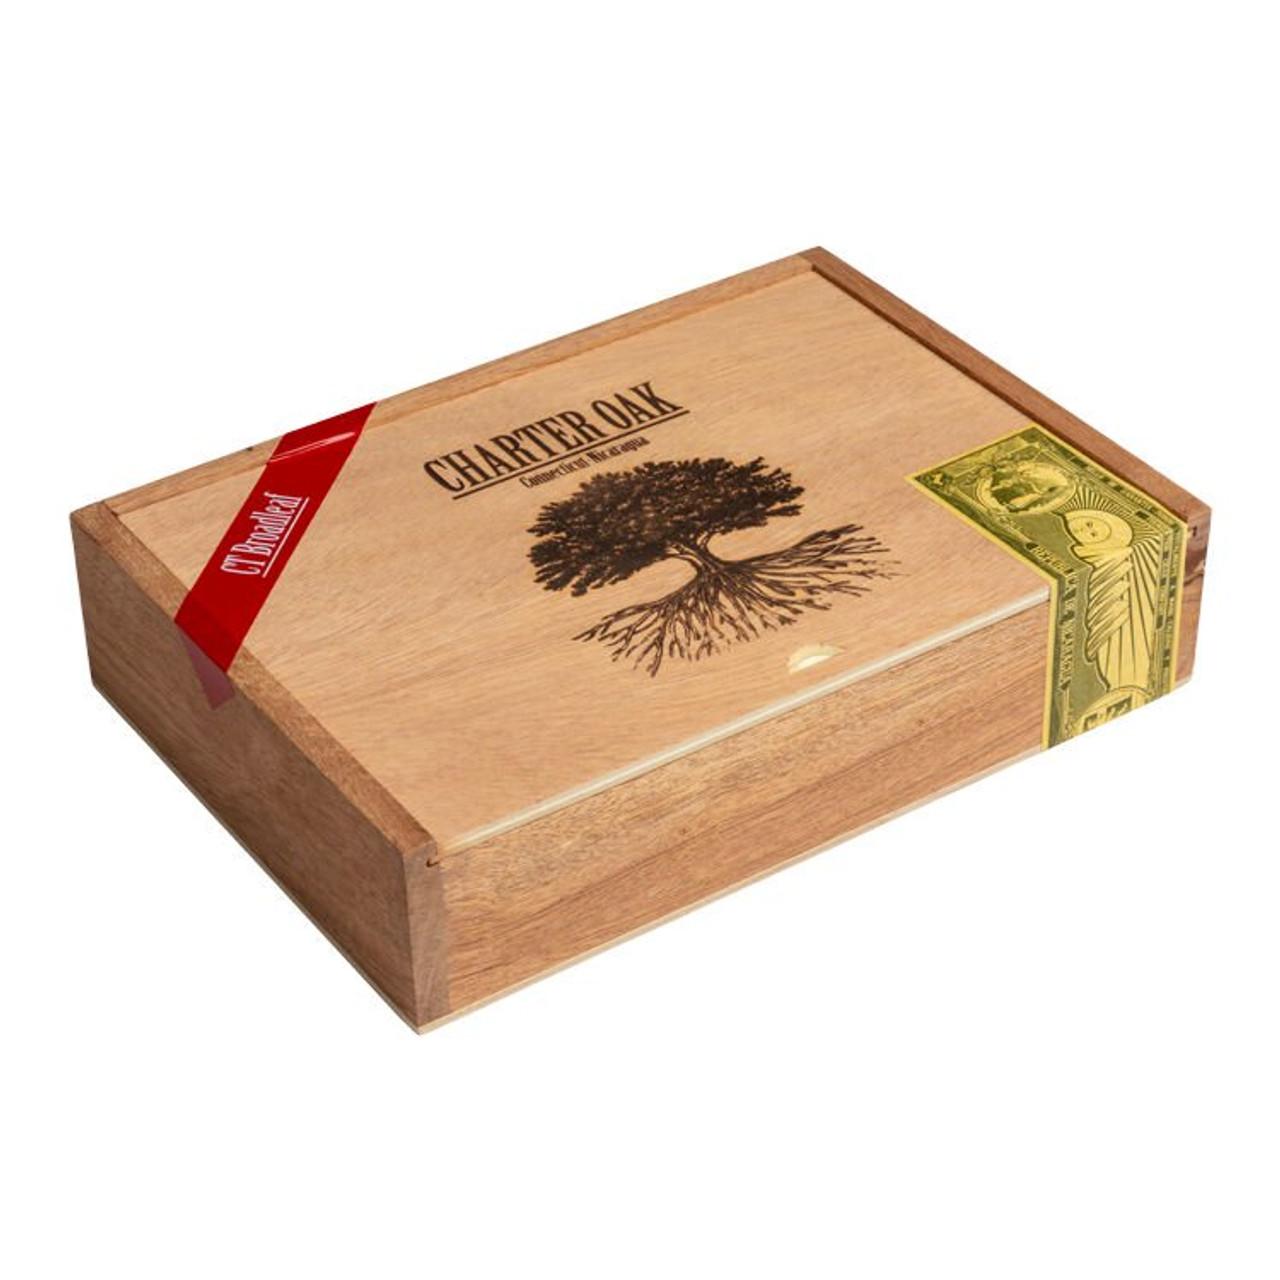 Foundation Charter Oak Lonsdale Maduro Cigars - 6.25 x 46 (Box of 20)